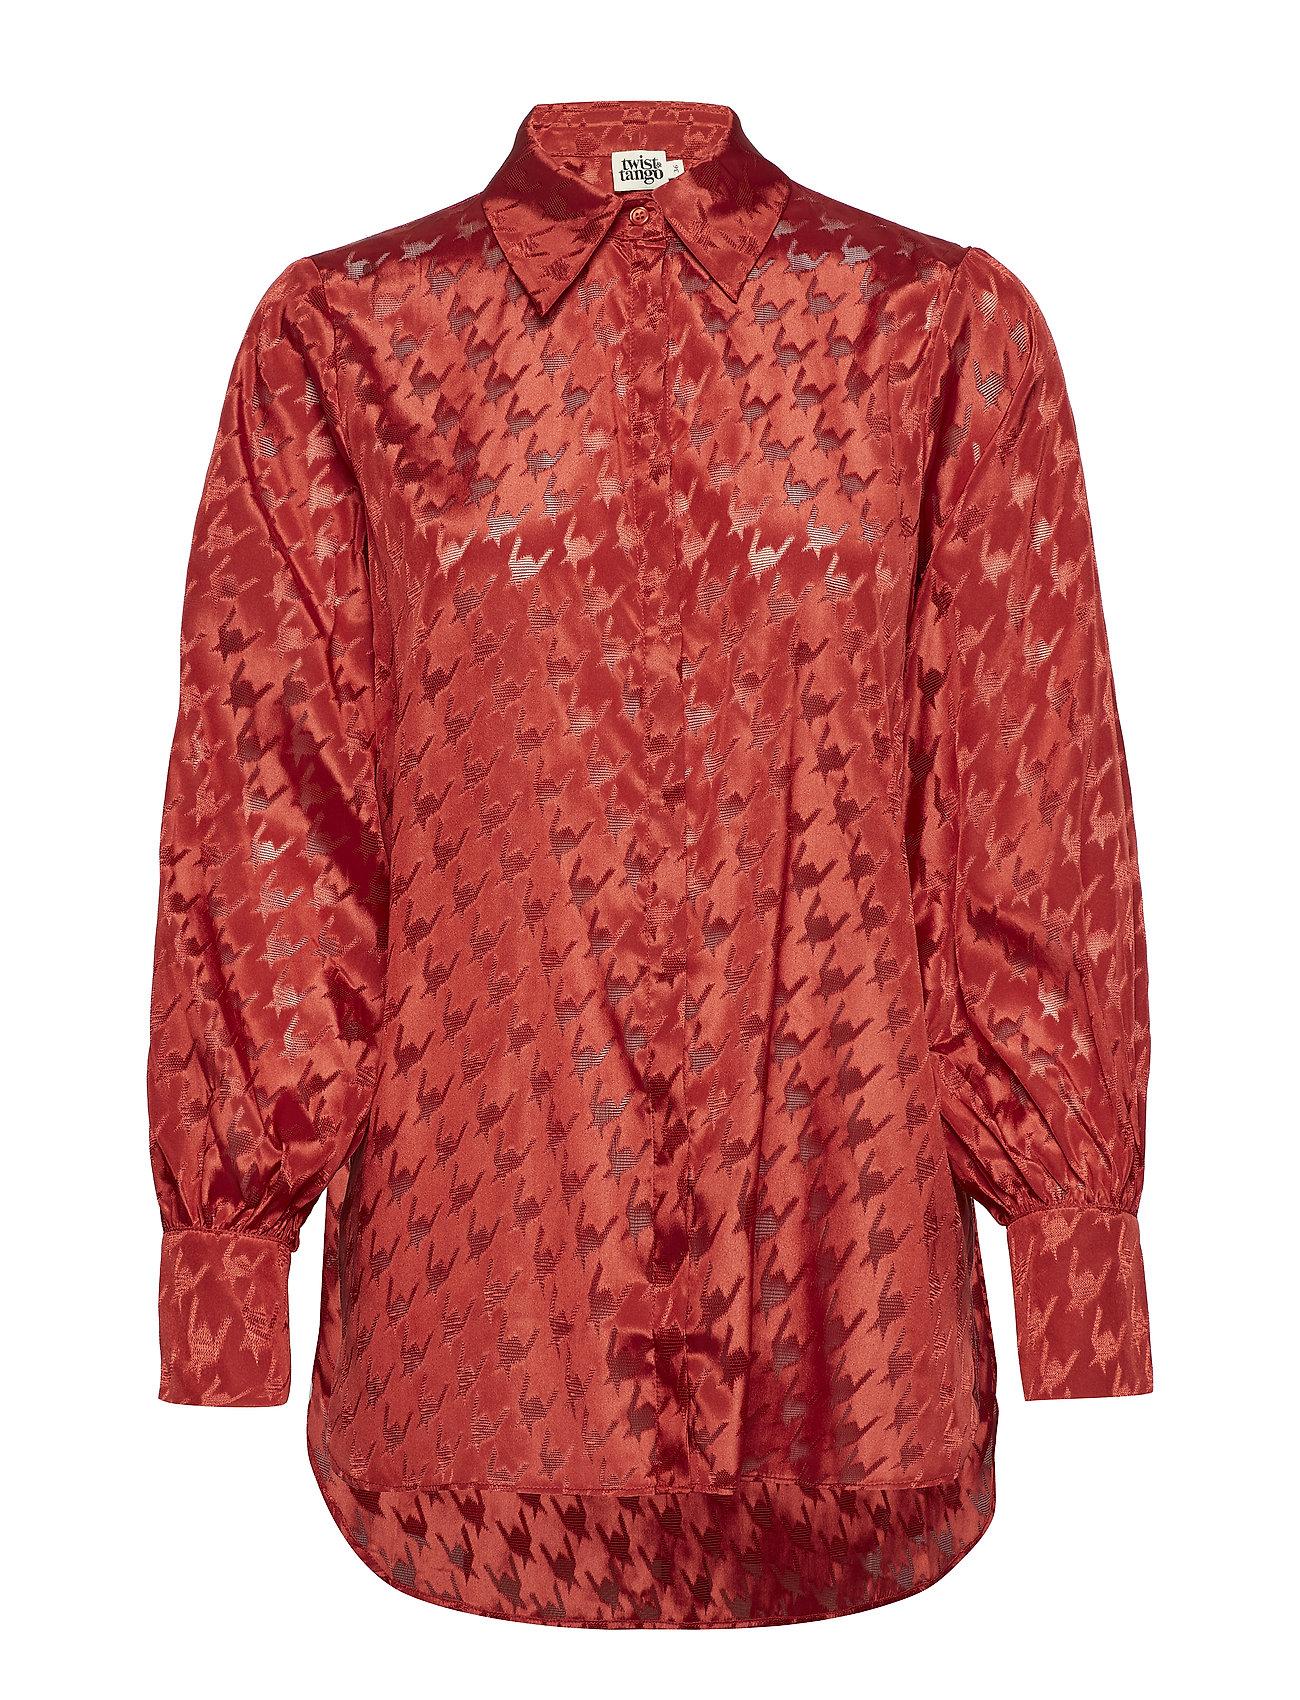 Twist & Tango Kathyn Shirt - RUSTY